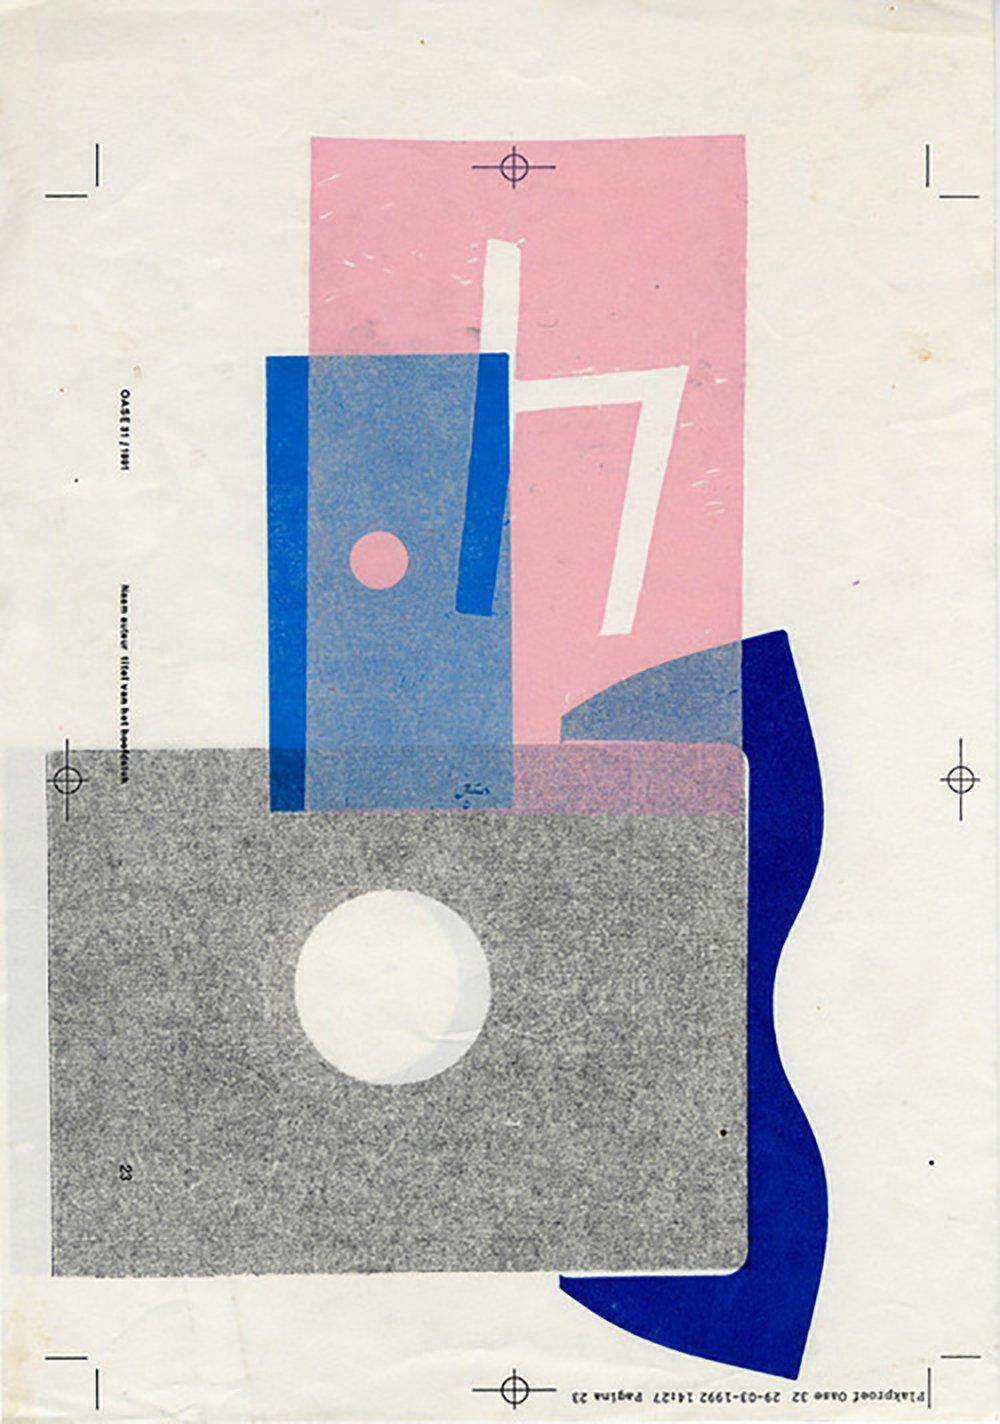 Karel-Martens-designplayground-14